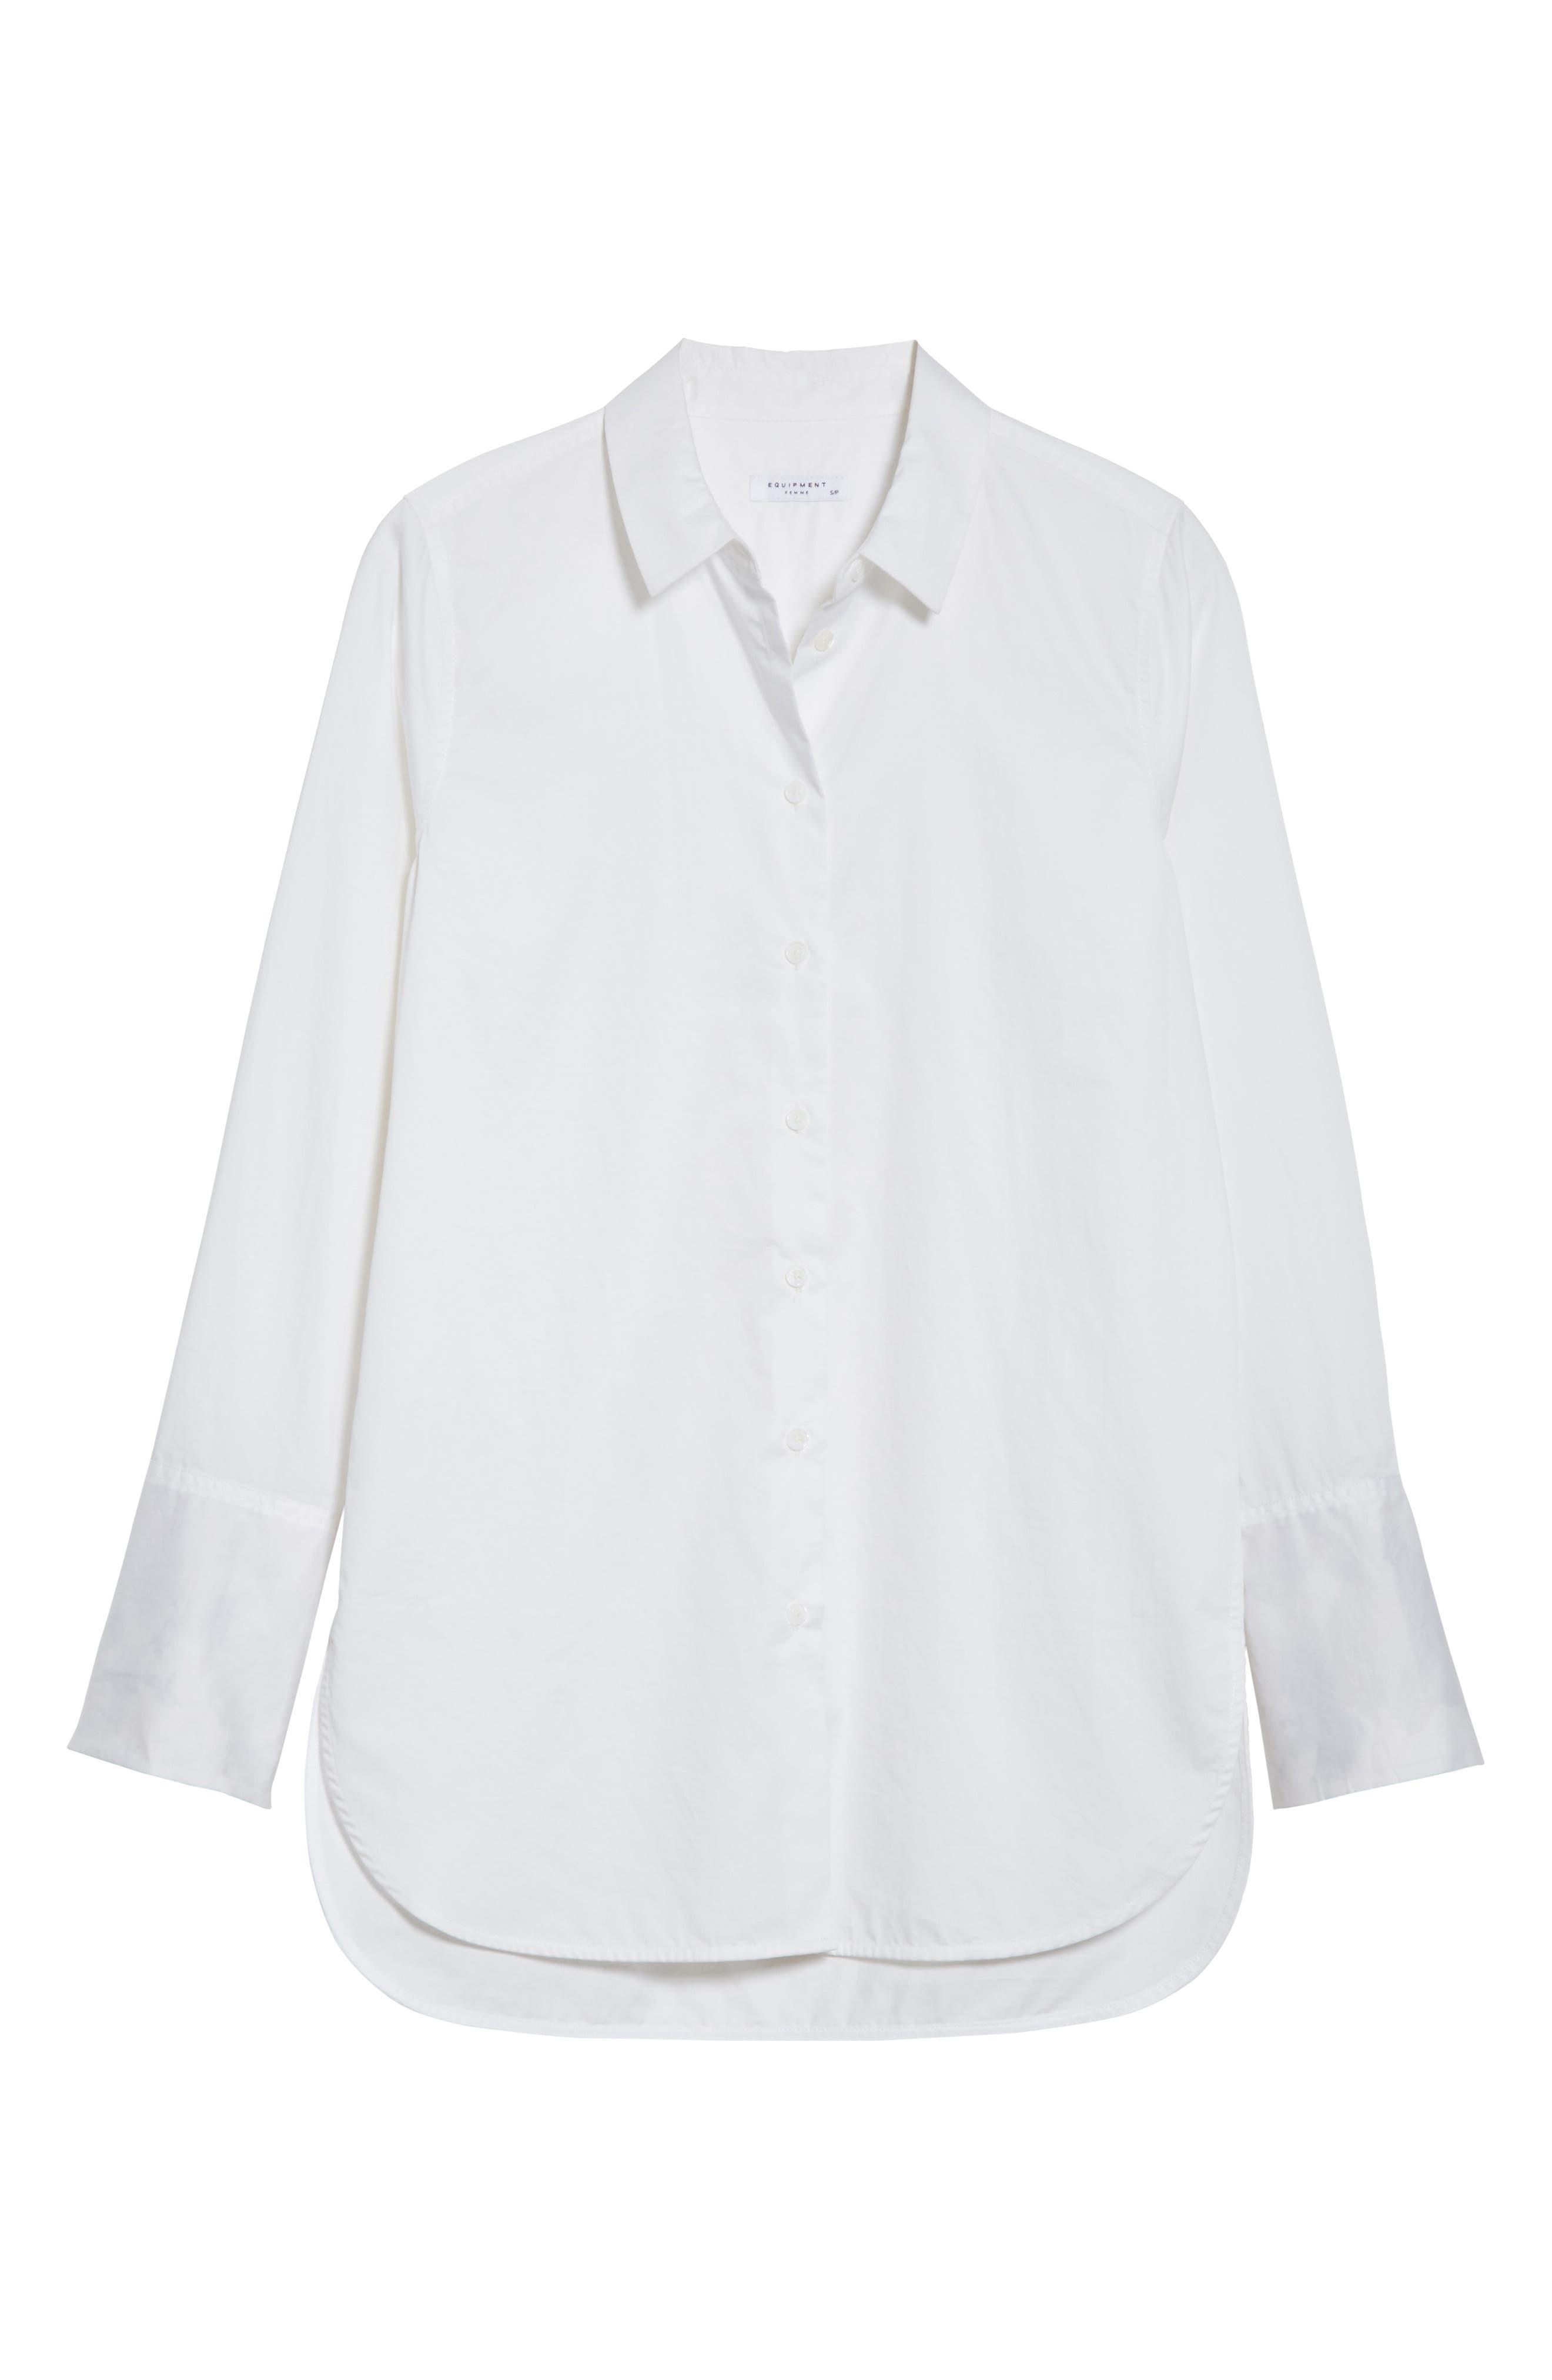 Arlette Cotton Shirt,                             Alternate thumbnail 6, color,                             Bright White